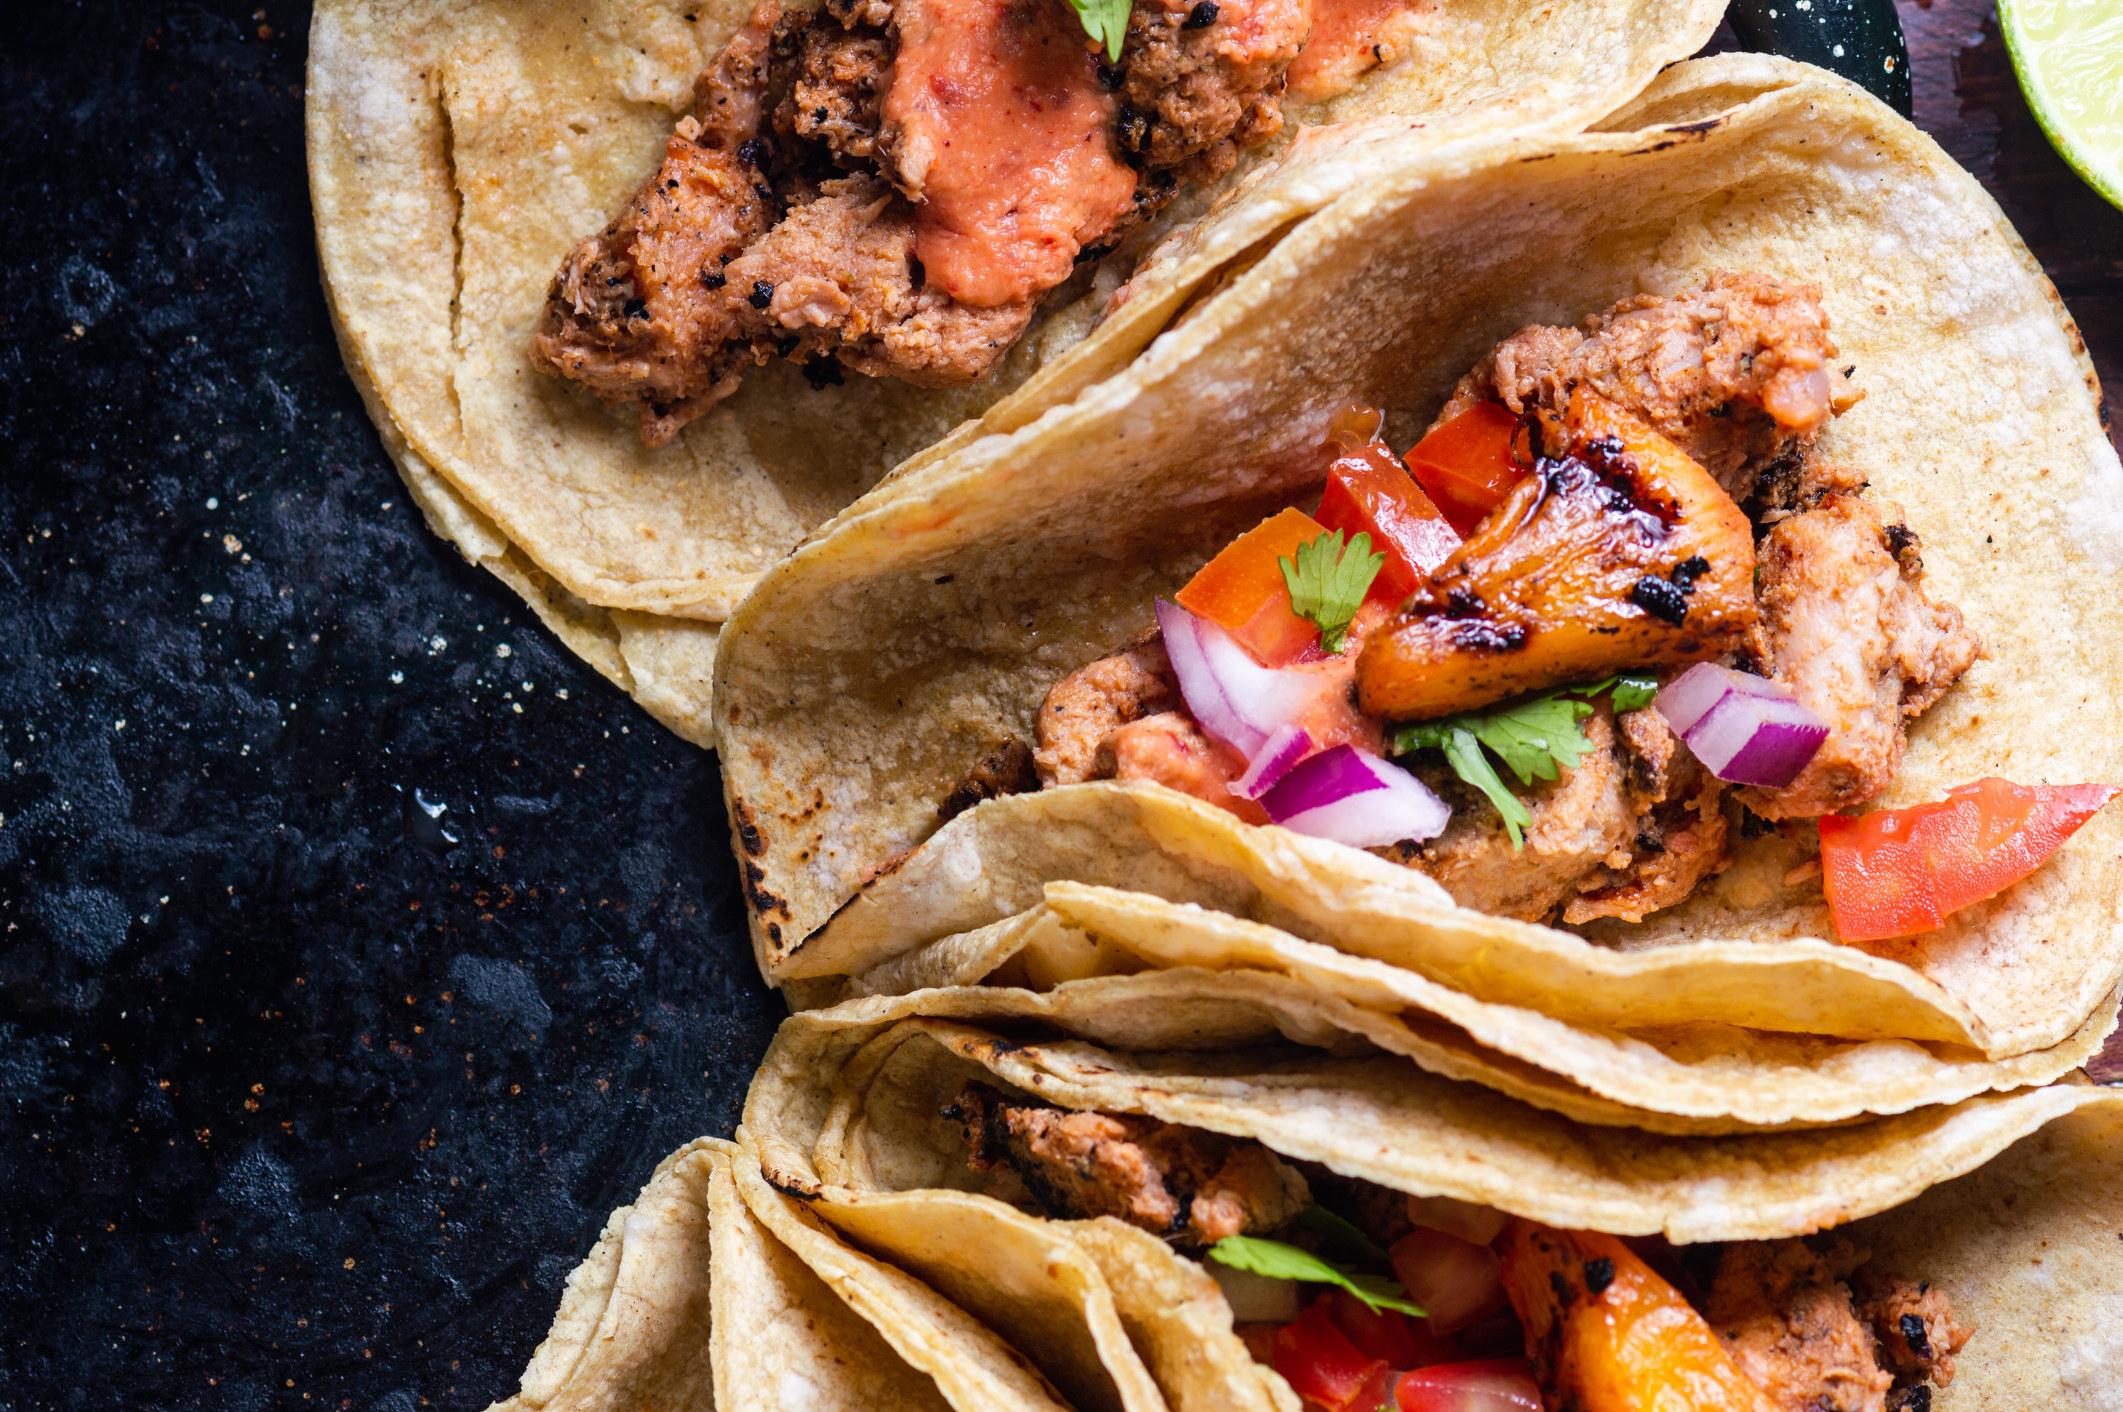 Several adobo tacos.